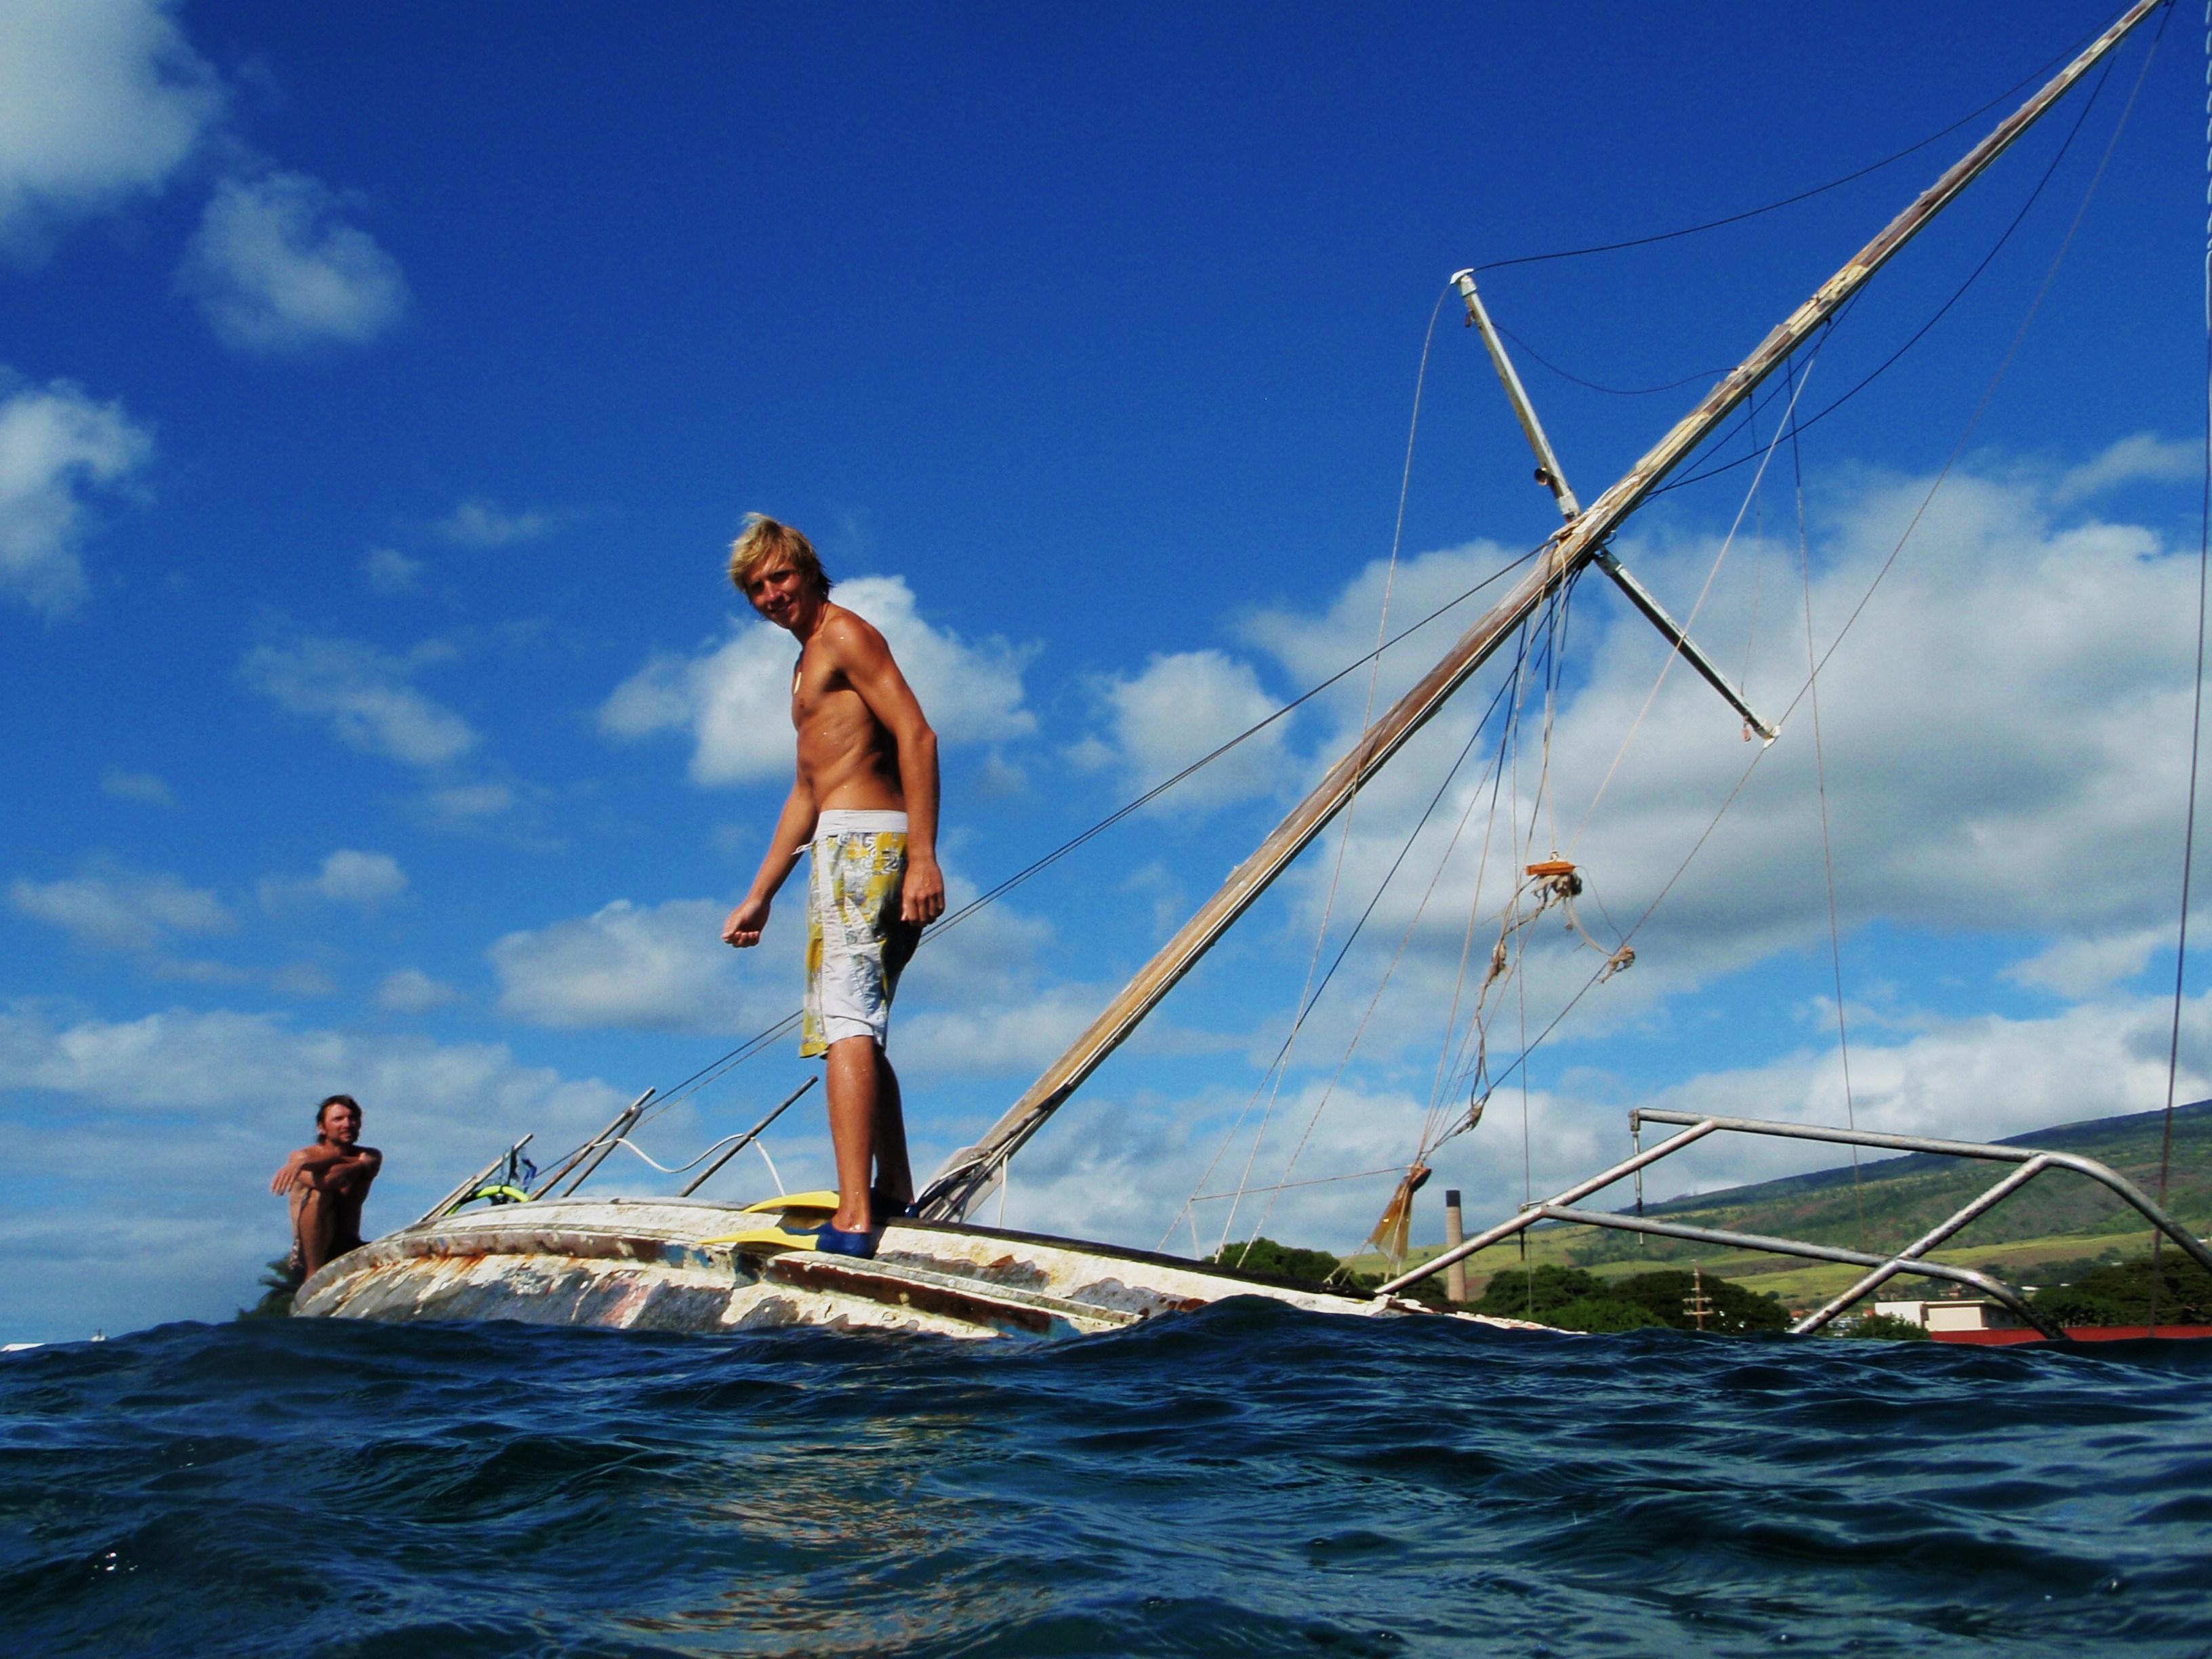 Südkap Surfing Sylt auf Hawaii